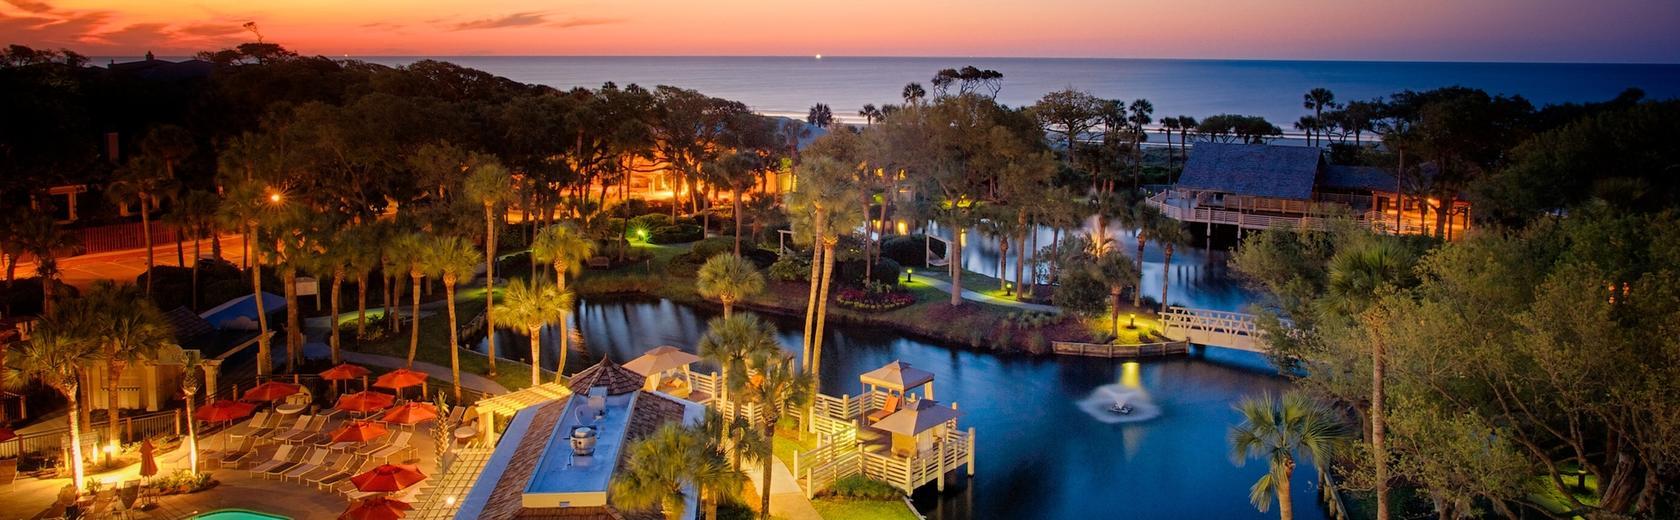 Best Kitchen Gallery: Sonesta Resort Hilton Head of Hilton Head Island Hotels And Resorts  on rachelxblog.com